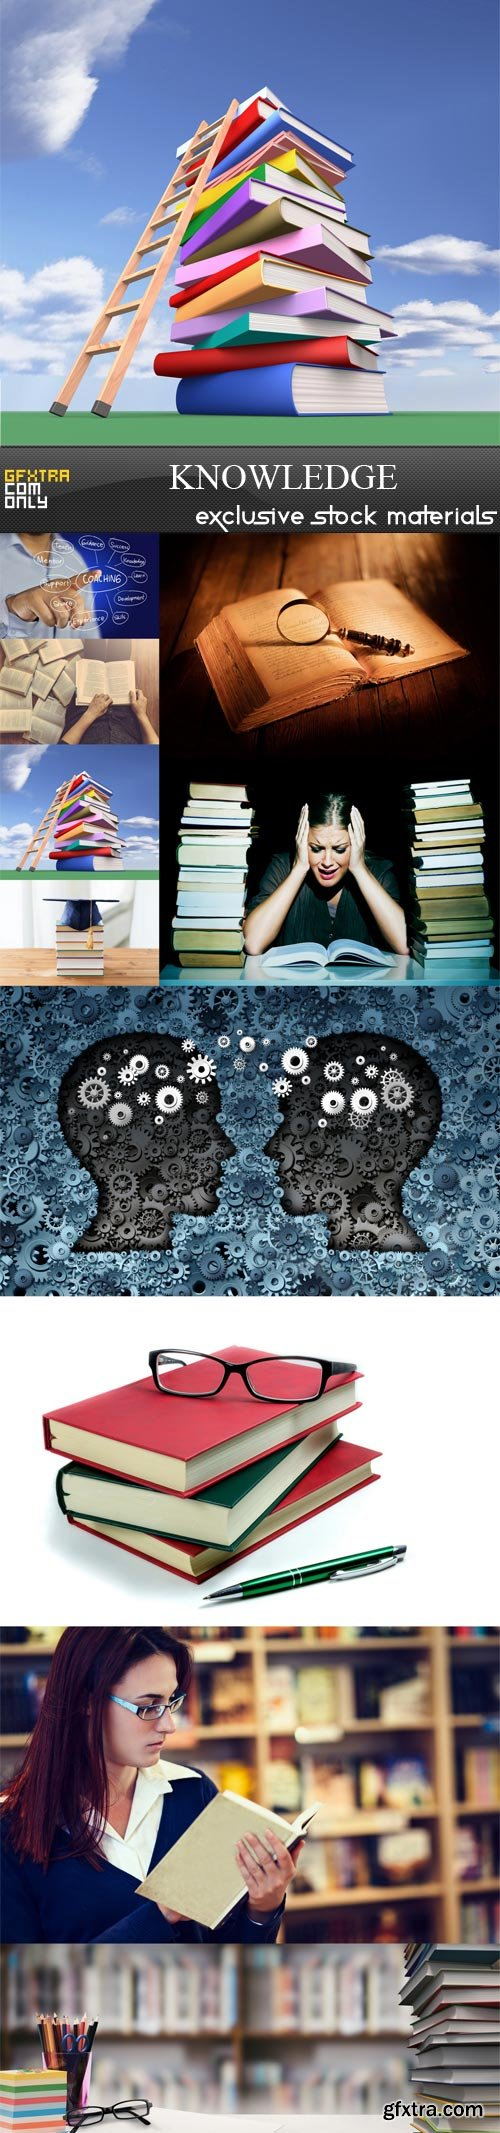 Knowledge, 10 UHQ JPEG